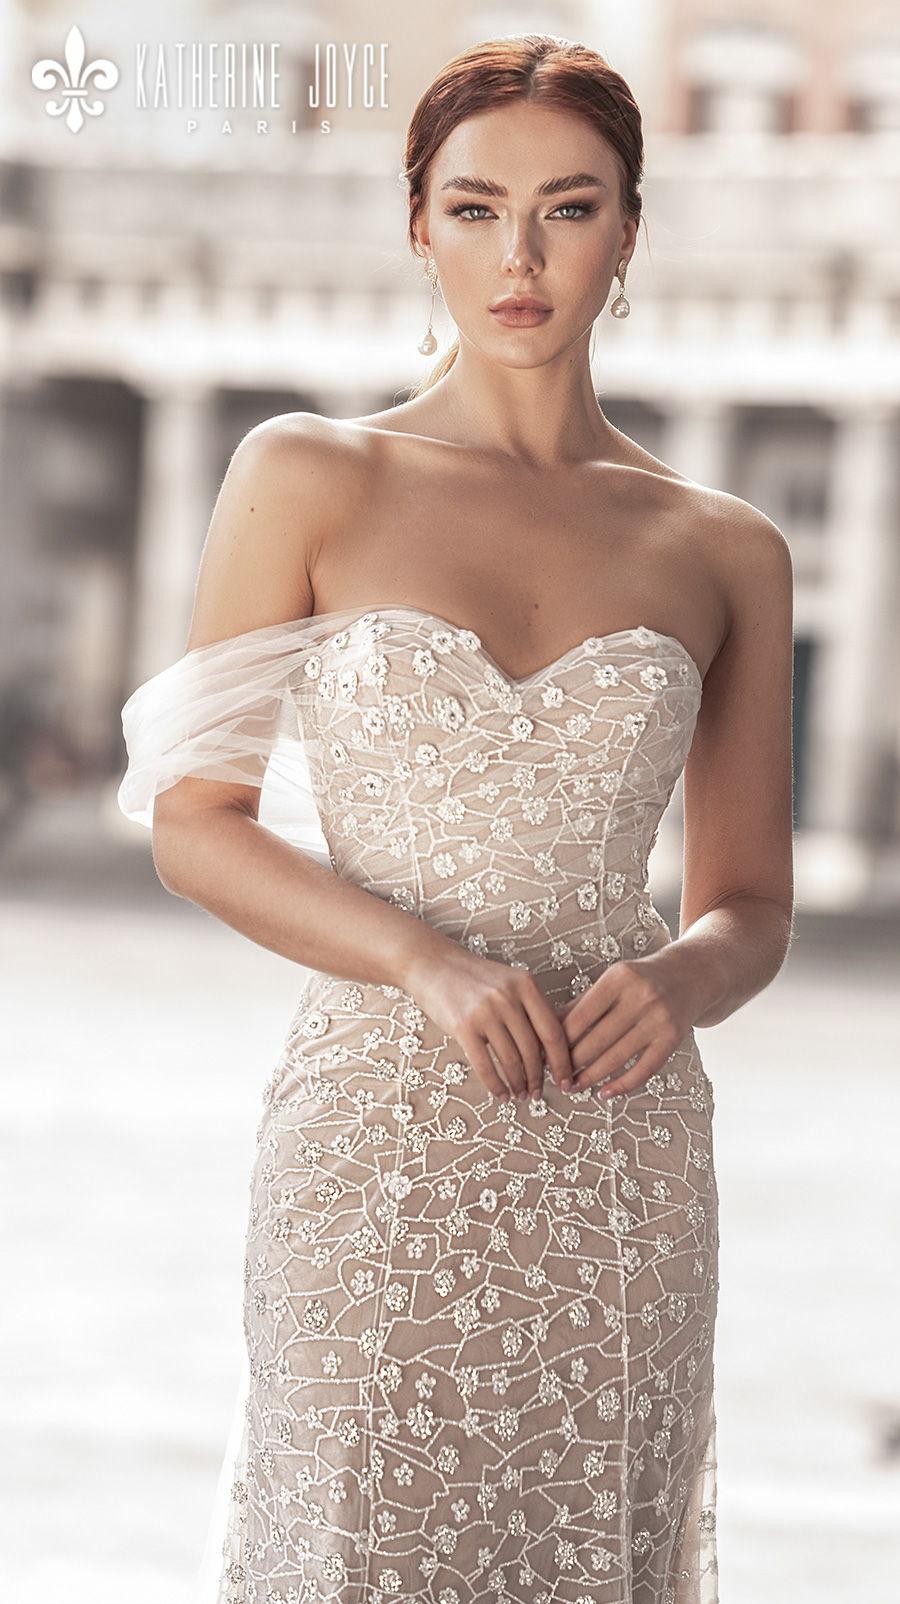 katherine joyce 2021 naples bridal one shoulder sweetheart neckline full embellishment romantic fit and flare ivory wedding dress mid back medium train (zarina) zv